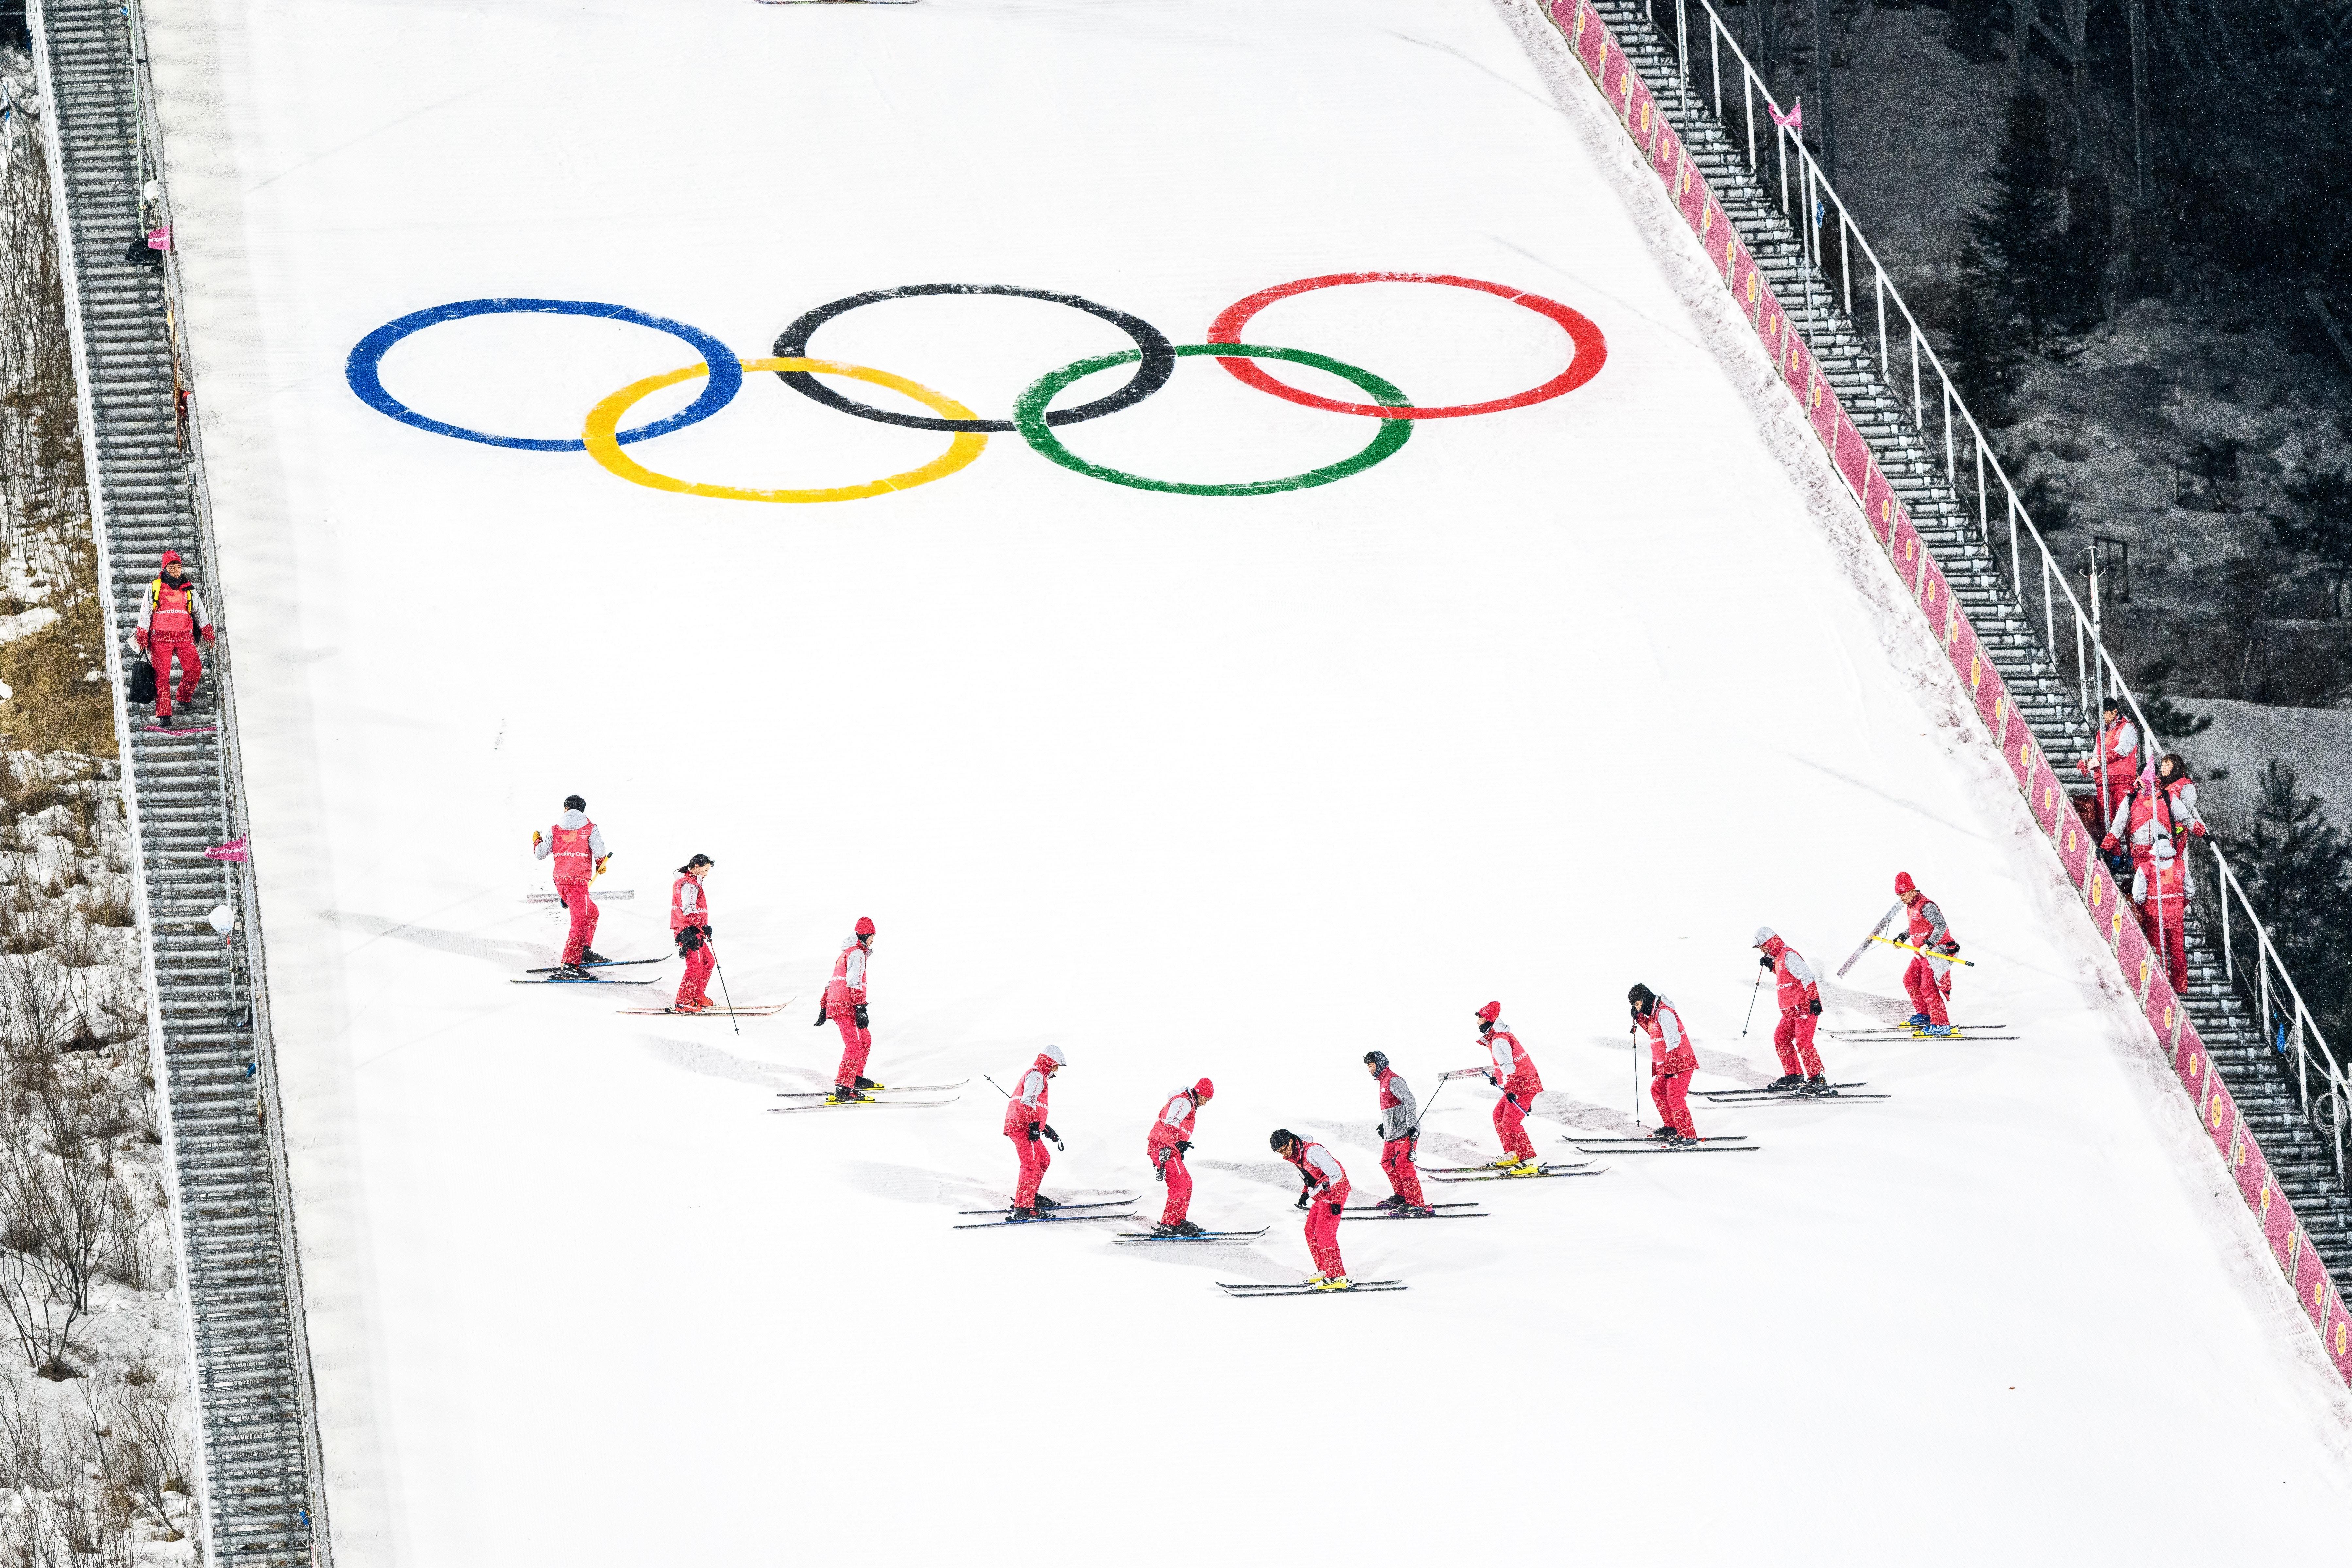 vytautas dranginis 588110 unsplash - Environmental Impact of the Olympics